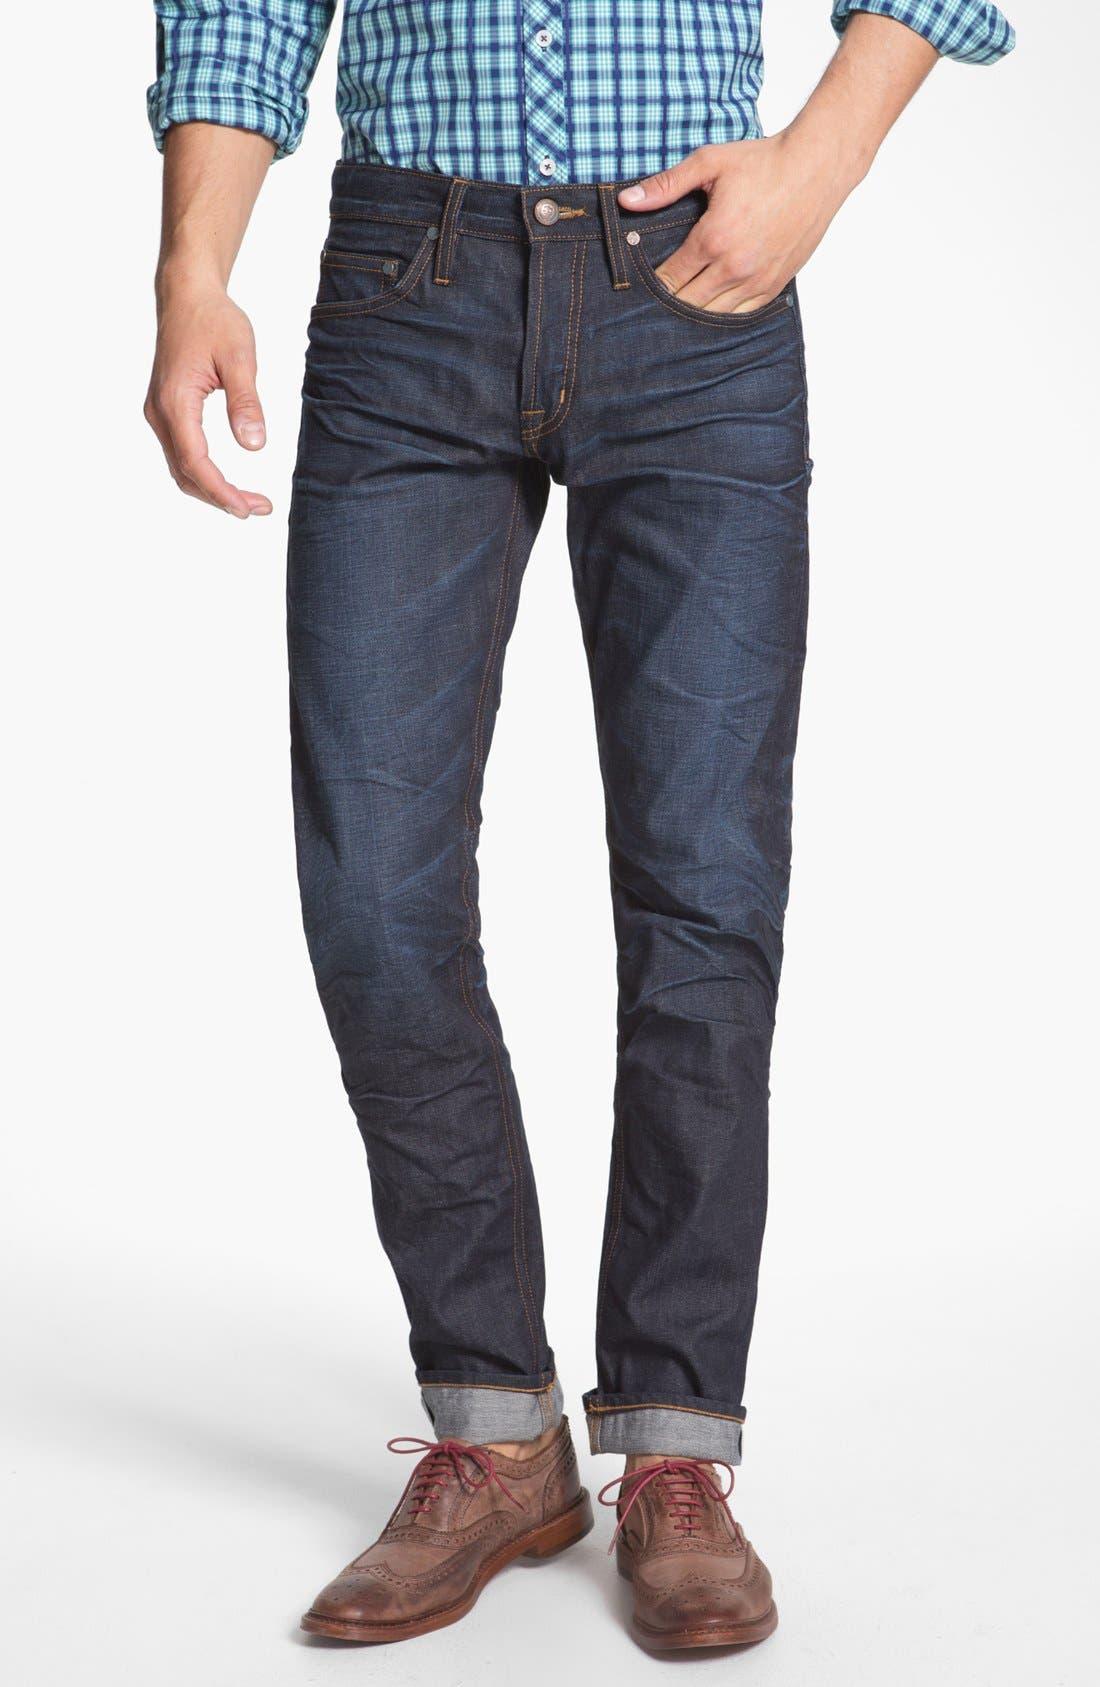 Main Image - Asbury Park '1888 Skinny Fit' Raw Selvedge Jeans